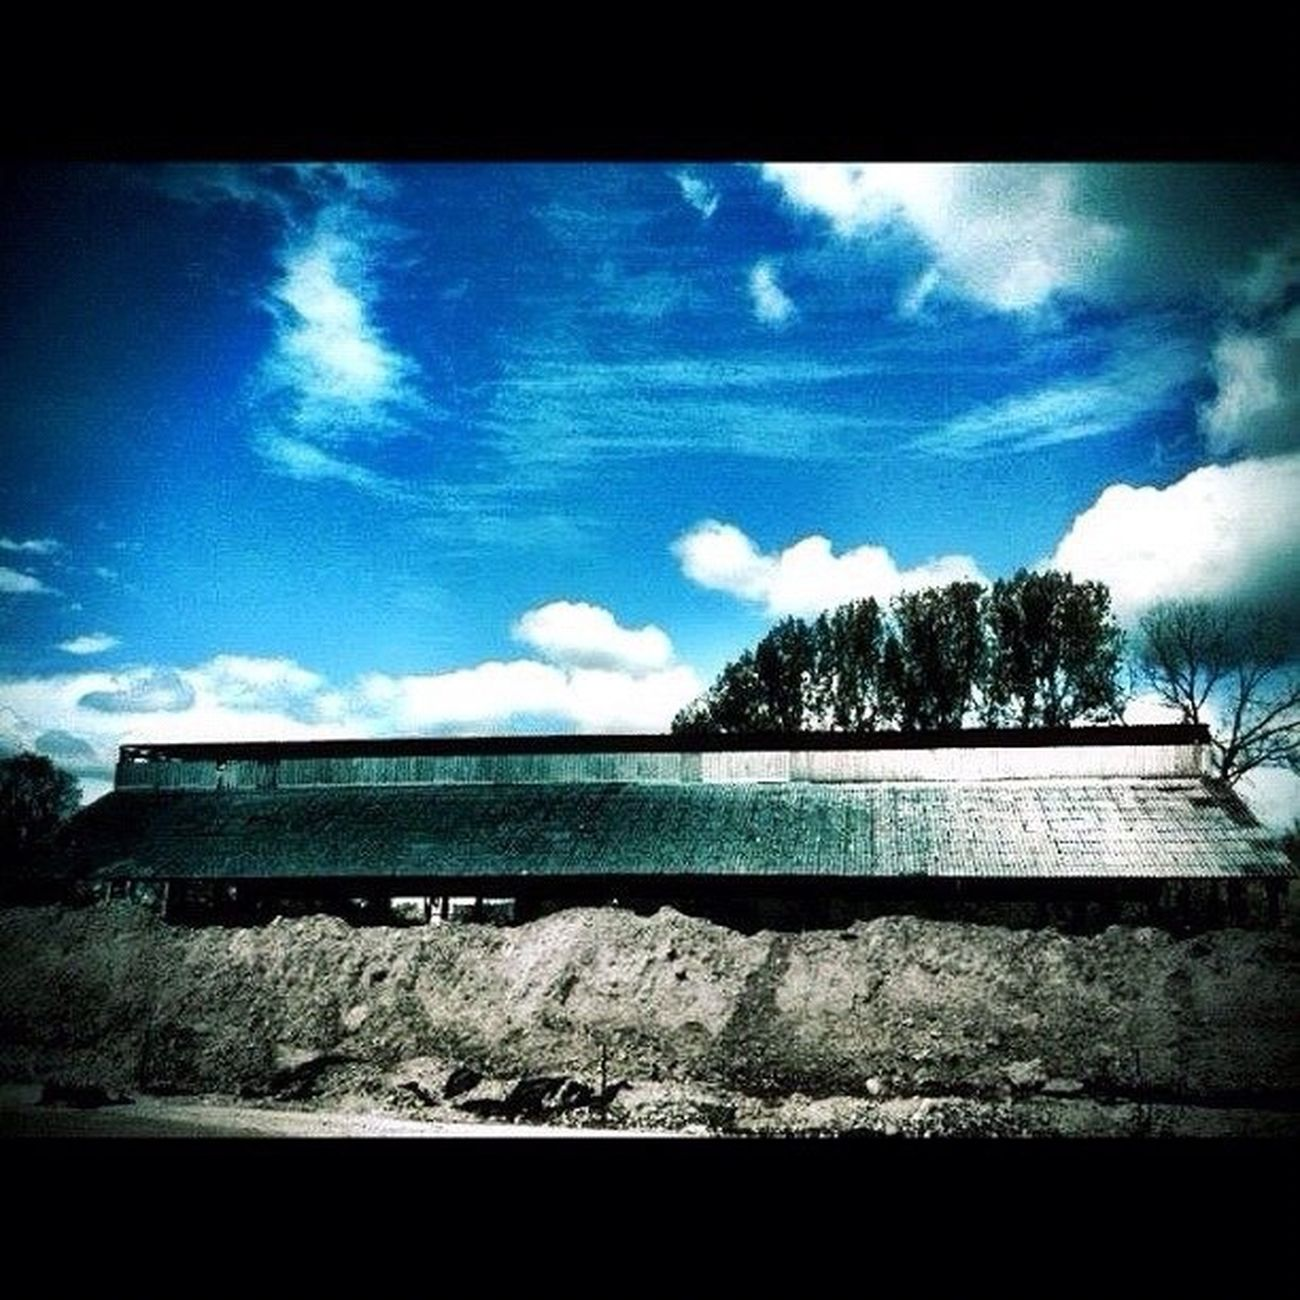 #brick #brickstalker#brickoftheday #bricklover #urbex #igersholland #igville #urban #urbandecay #decay #urbanexploration #igtrespasser #abandoned #derelict #dope #jj #yolo #instago #urbanexploration#insta_album #filthyfeeds#photowall #buildings #iph Instago Jj  Urban Brickstalker Abandoned Igaddict Derelict Hdrspotters Brick Royalsnappingartists Decay Igersholland Photowall Igtrespasser Buildings Photoport Yolo Igville Urbex Insta_album Iphonesia Brickoftheday DOPE Bricklover Urbandecay Filthyfeeds Urbanexploration